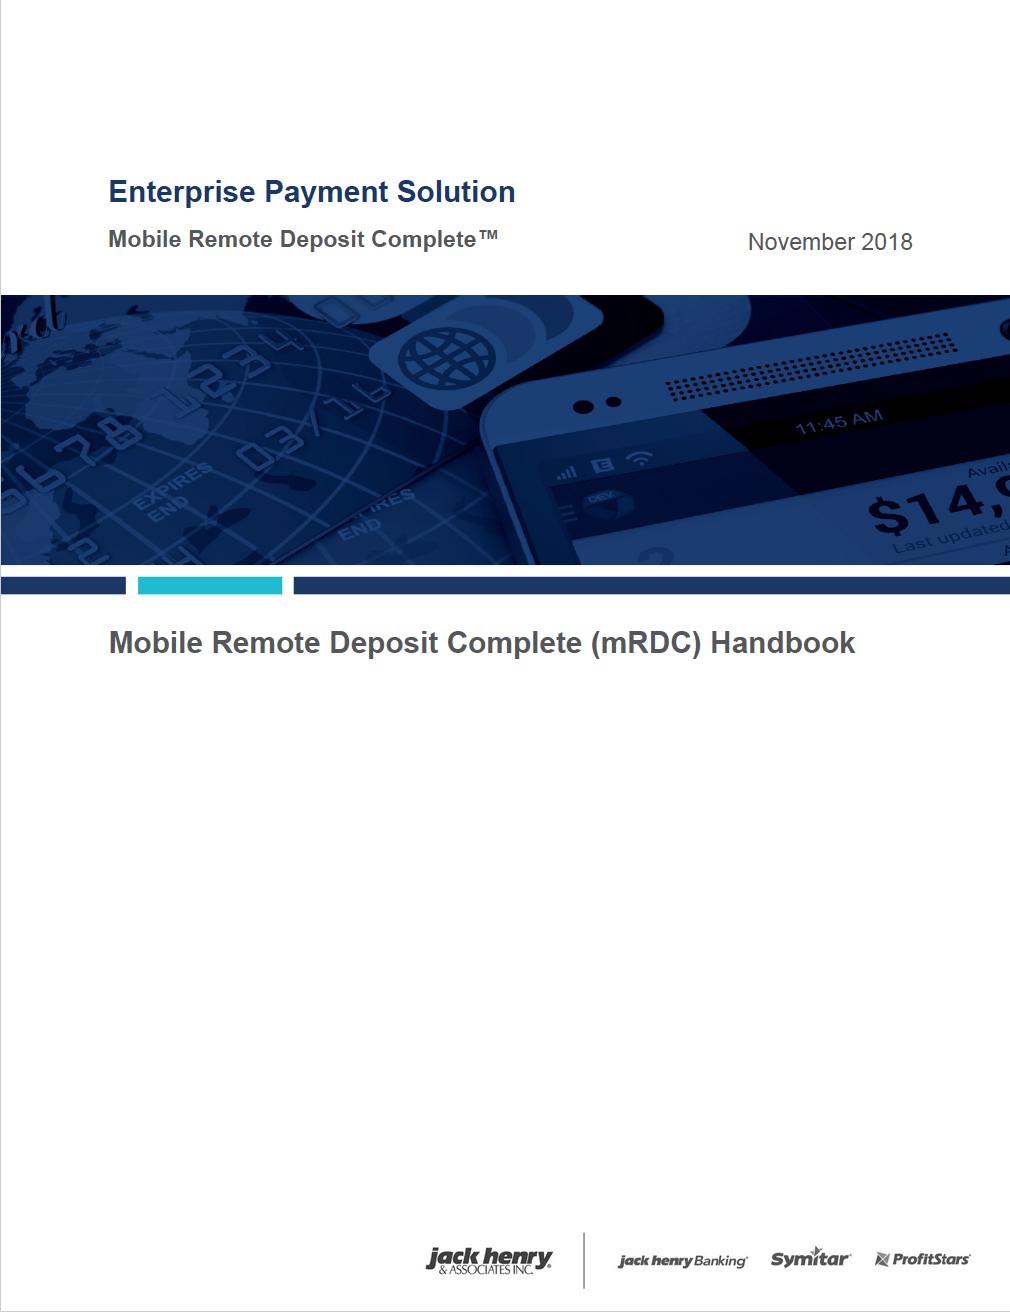 Mobile Remote Deposit Image